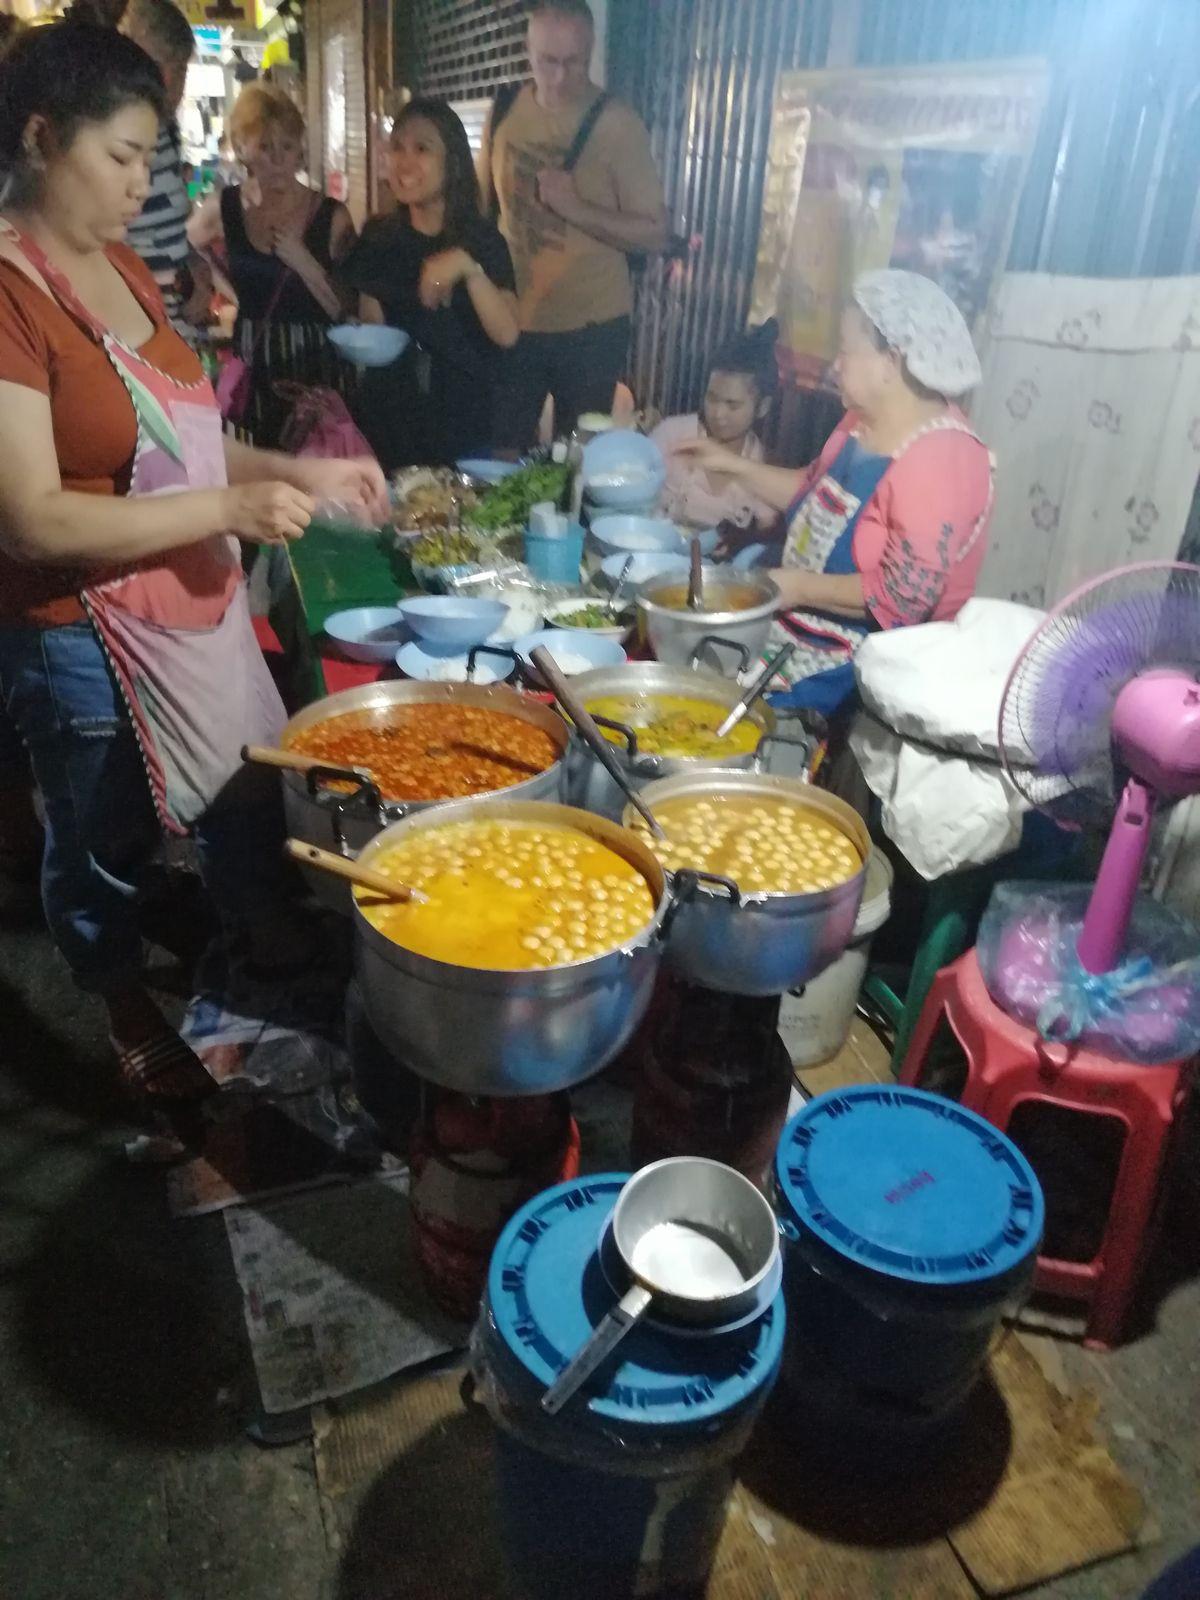 Canard laqué au cocorico - balade thaïlandaise